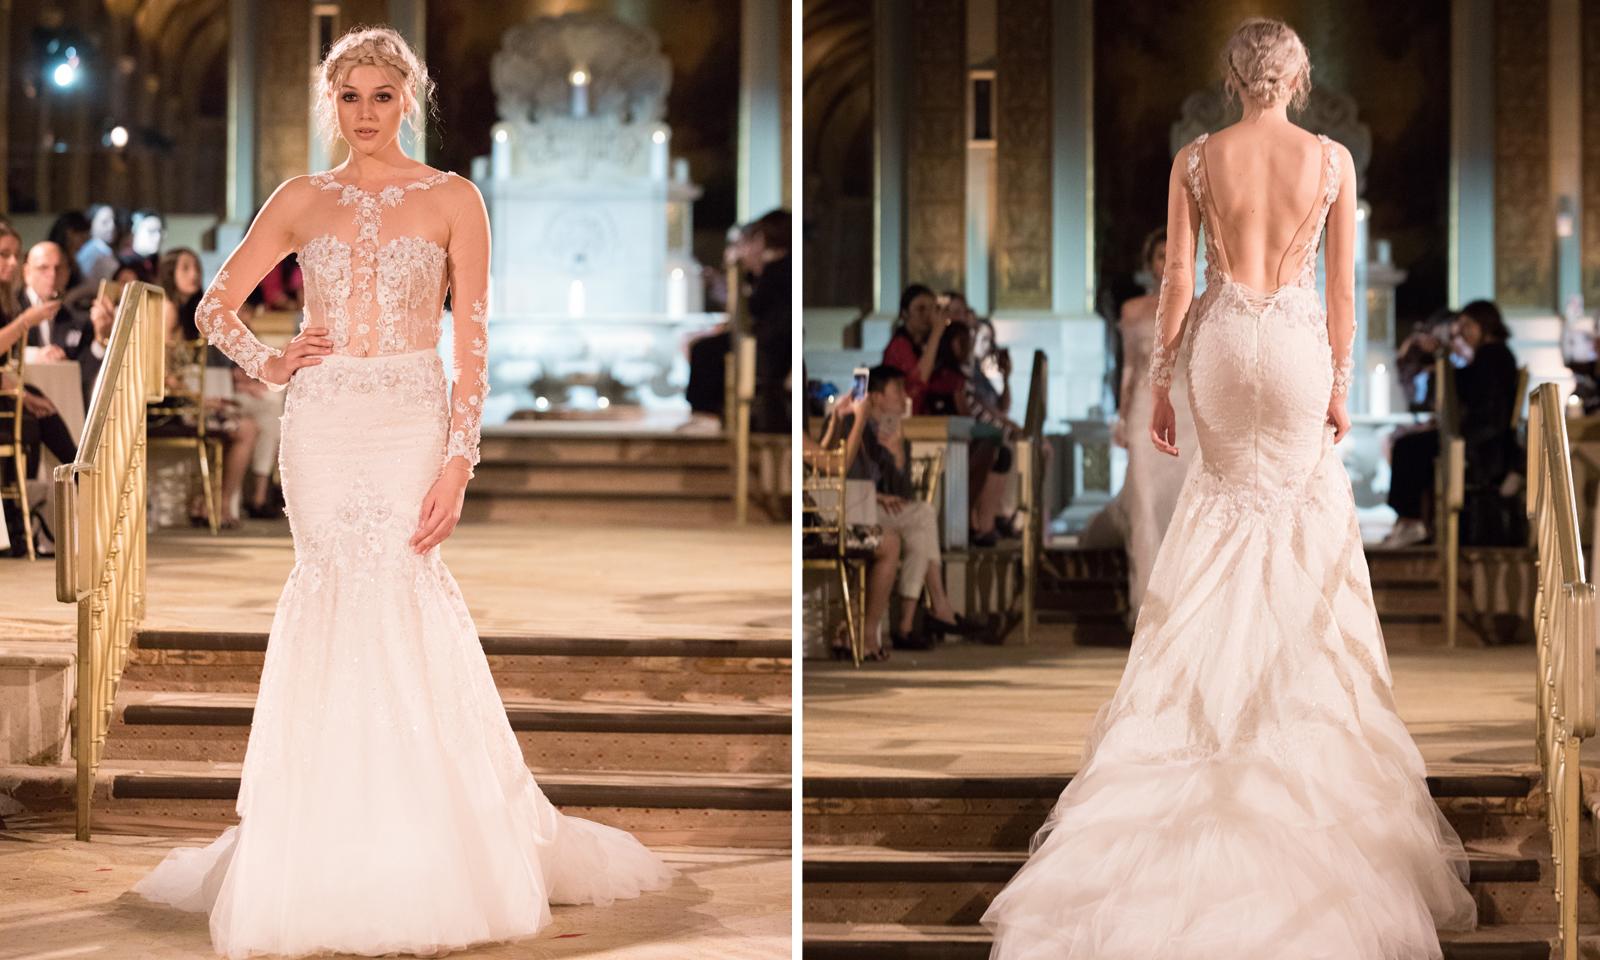 Emmerdales Charley Webb wows in wedding dress  Daily